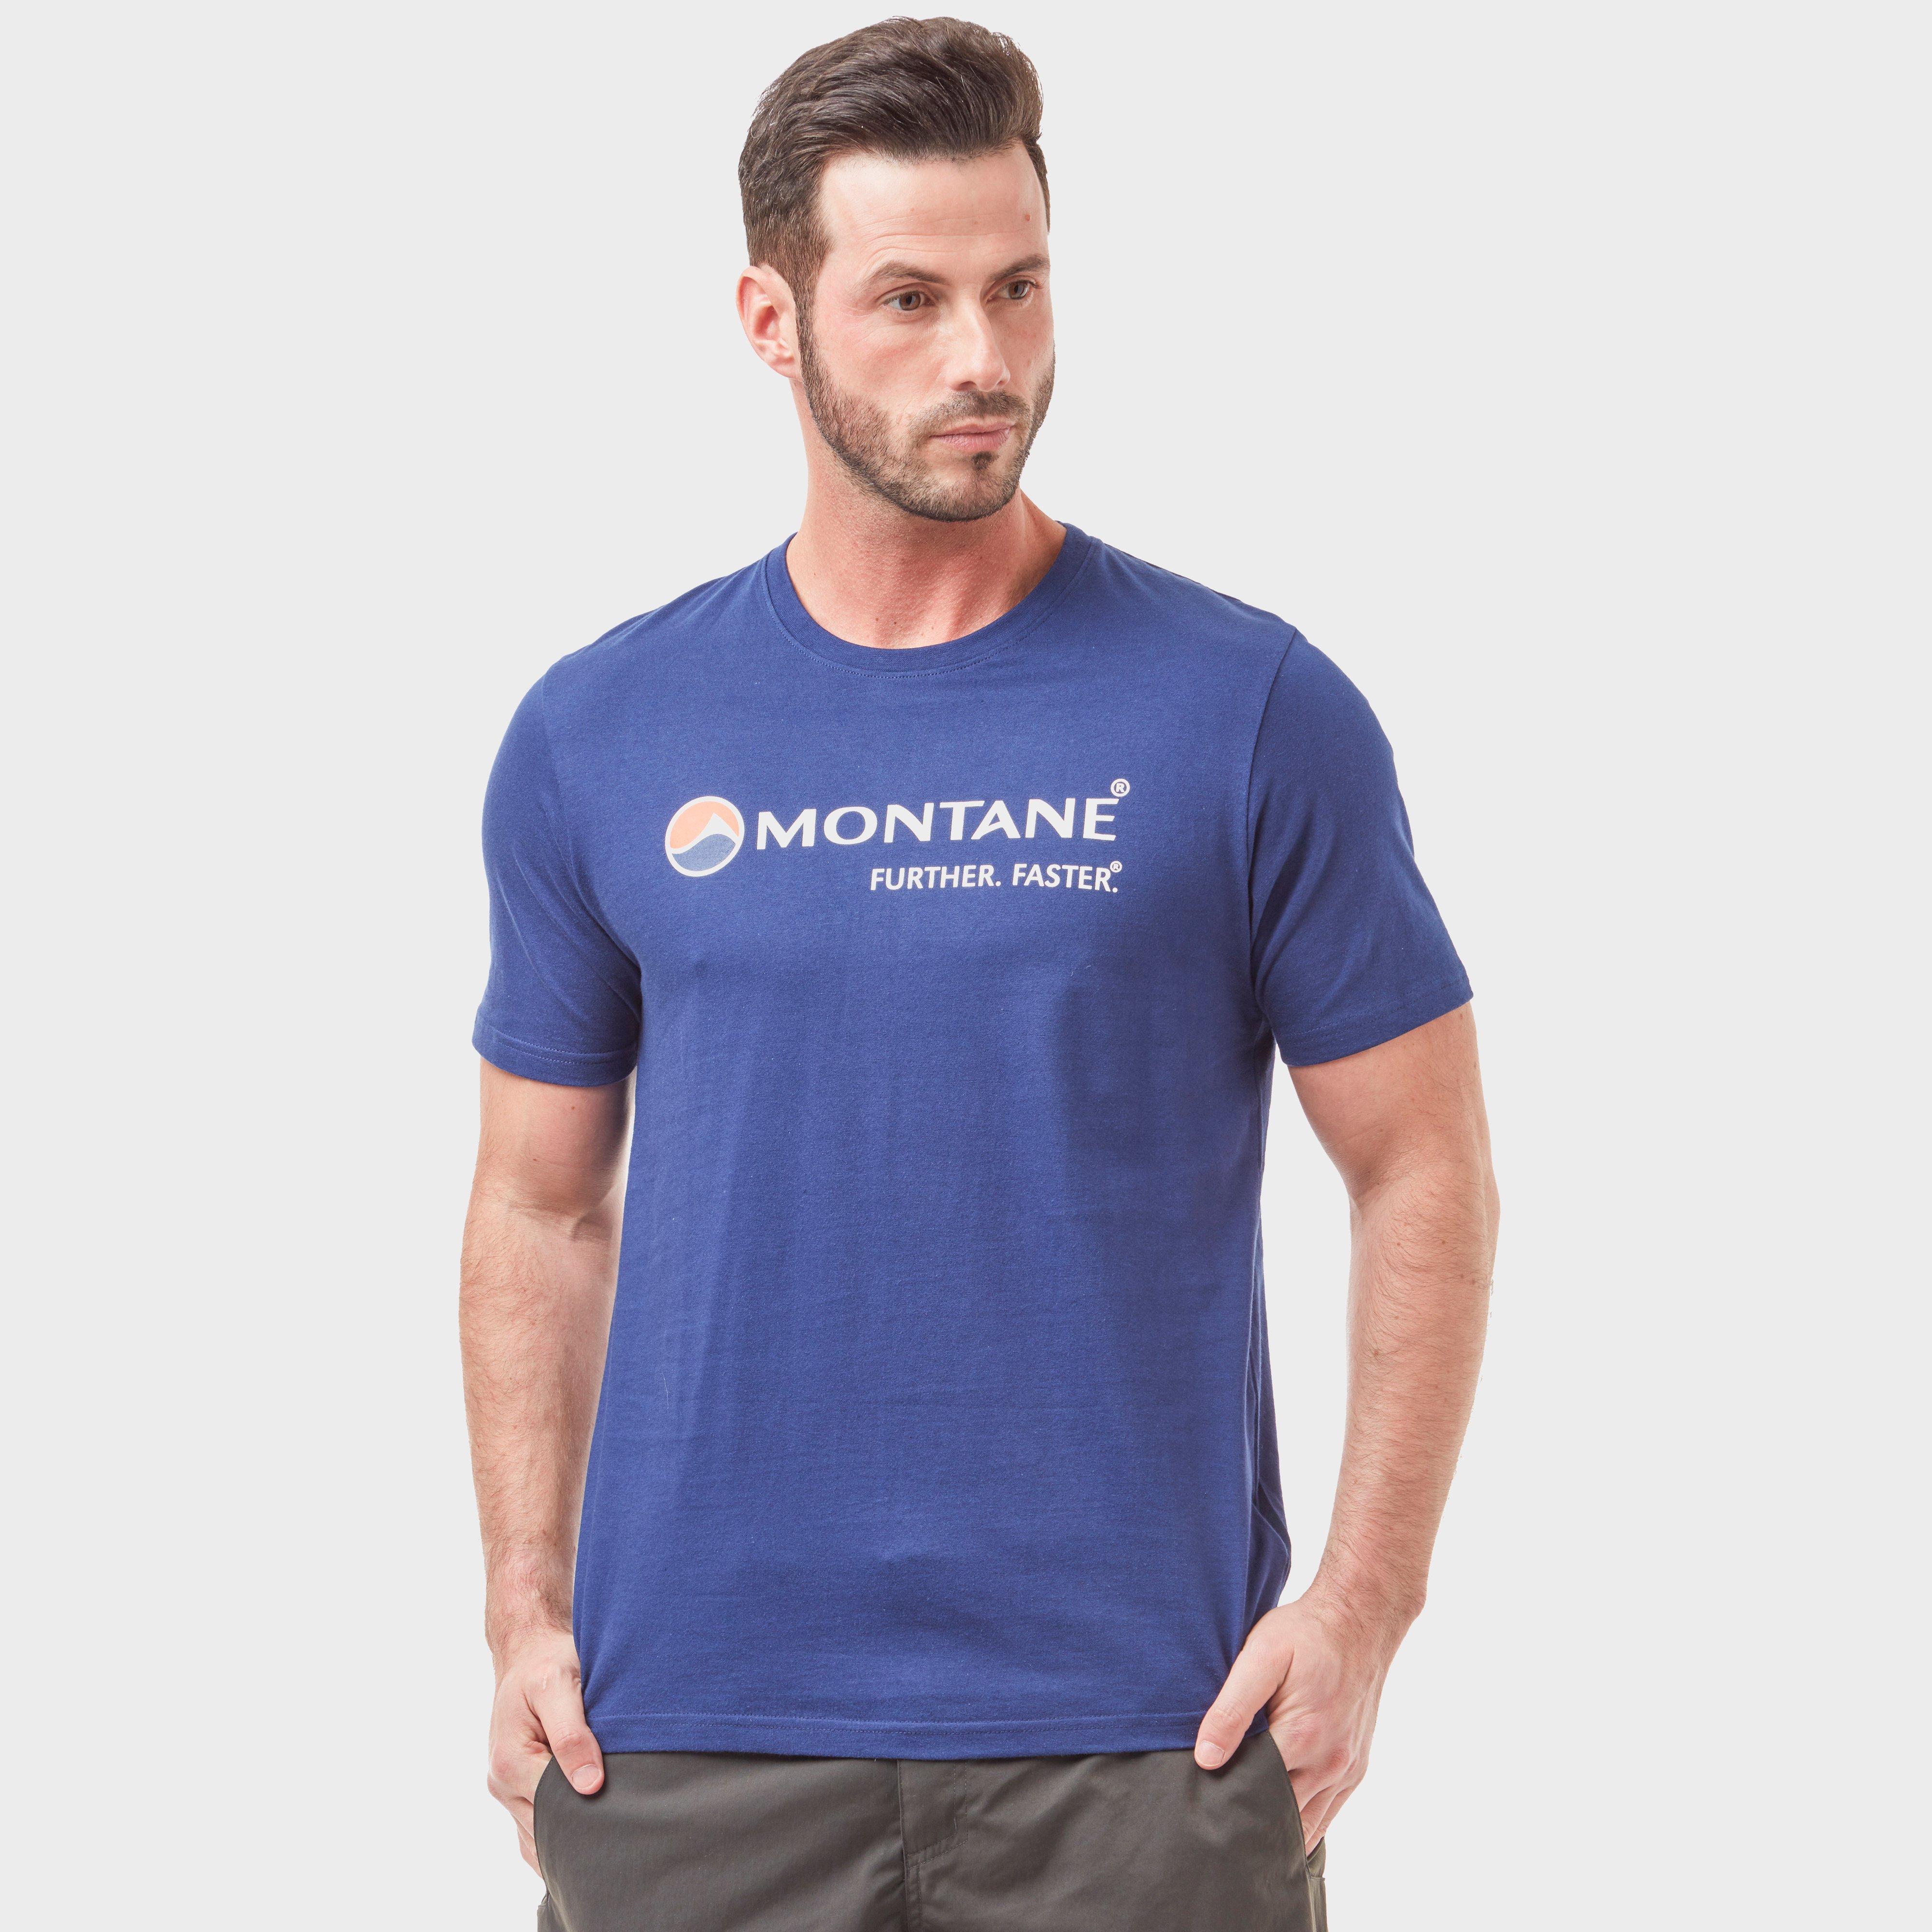 Montane Montane Mens Logo Tee - Blue, Blue